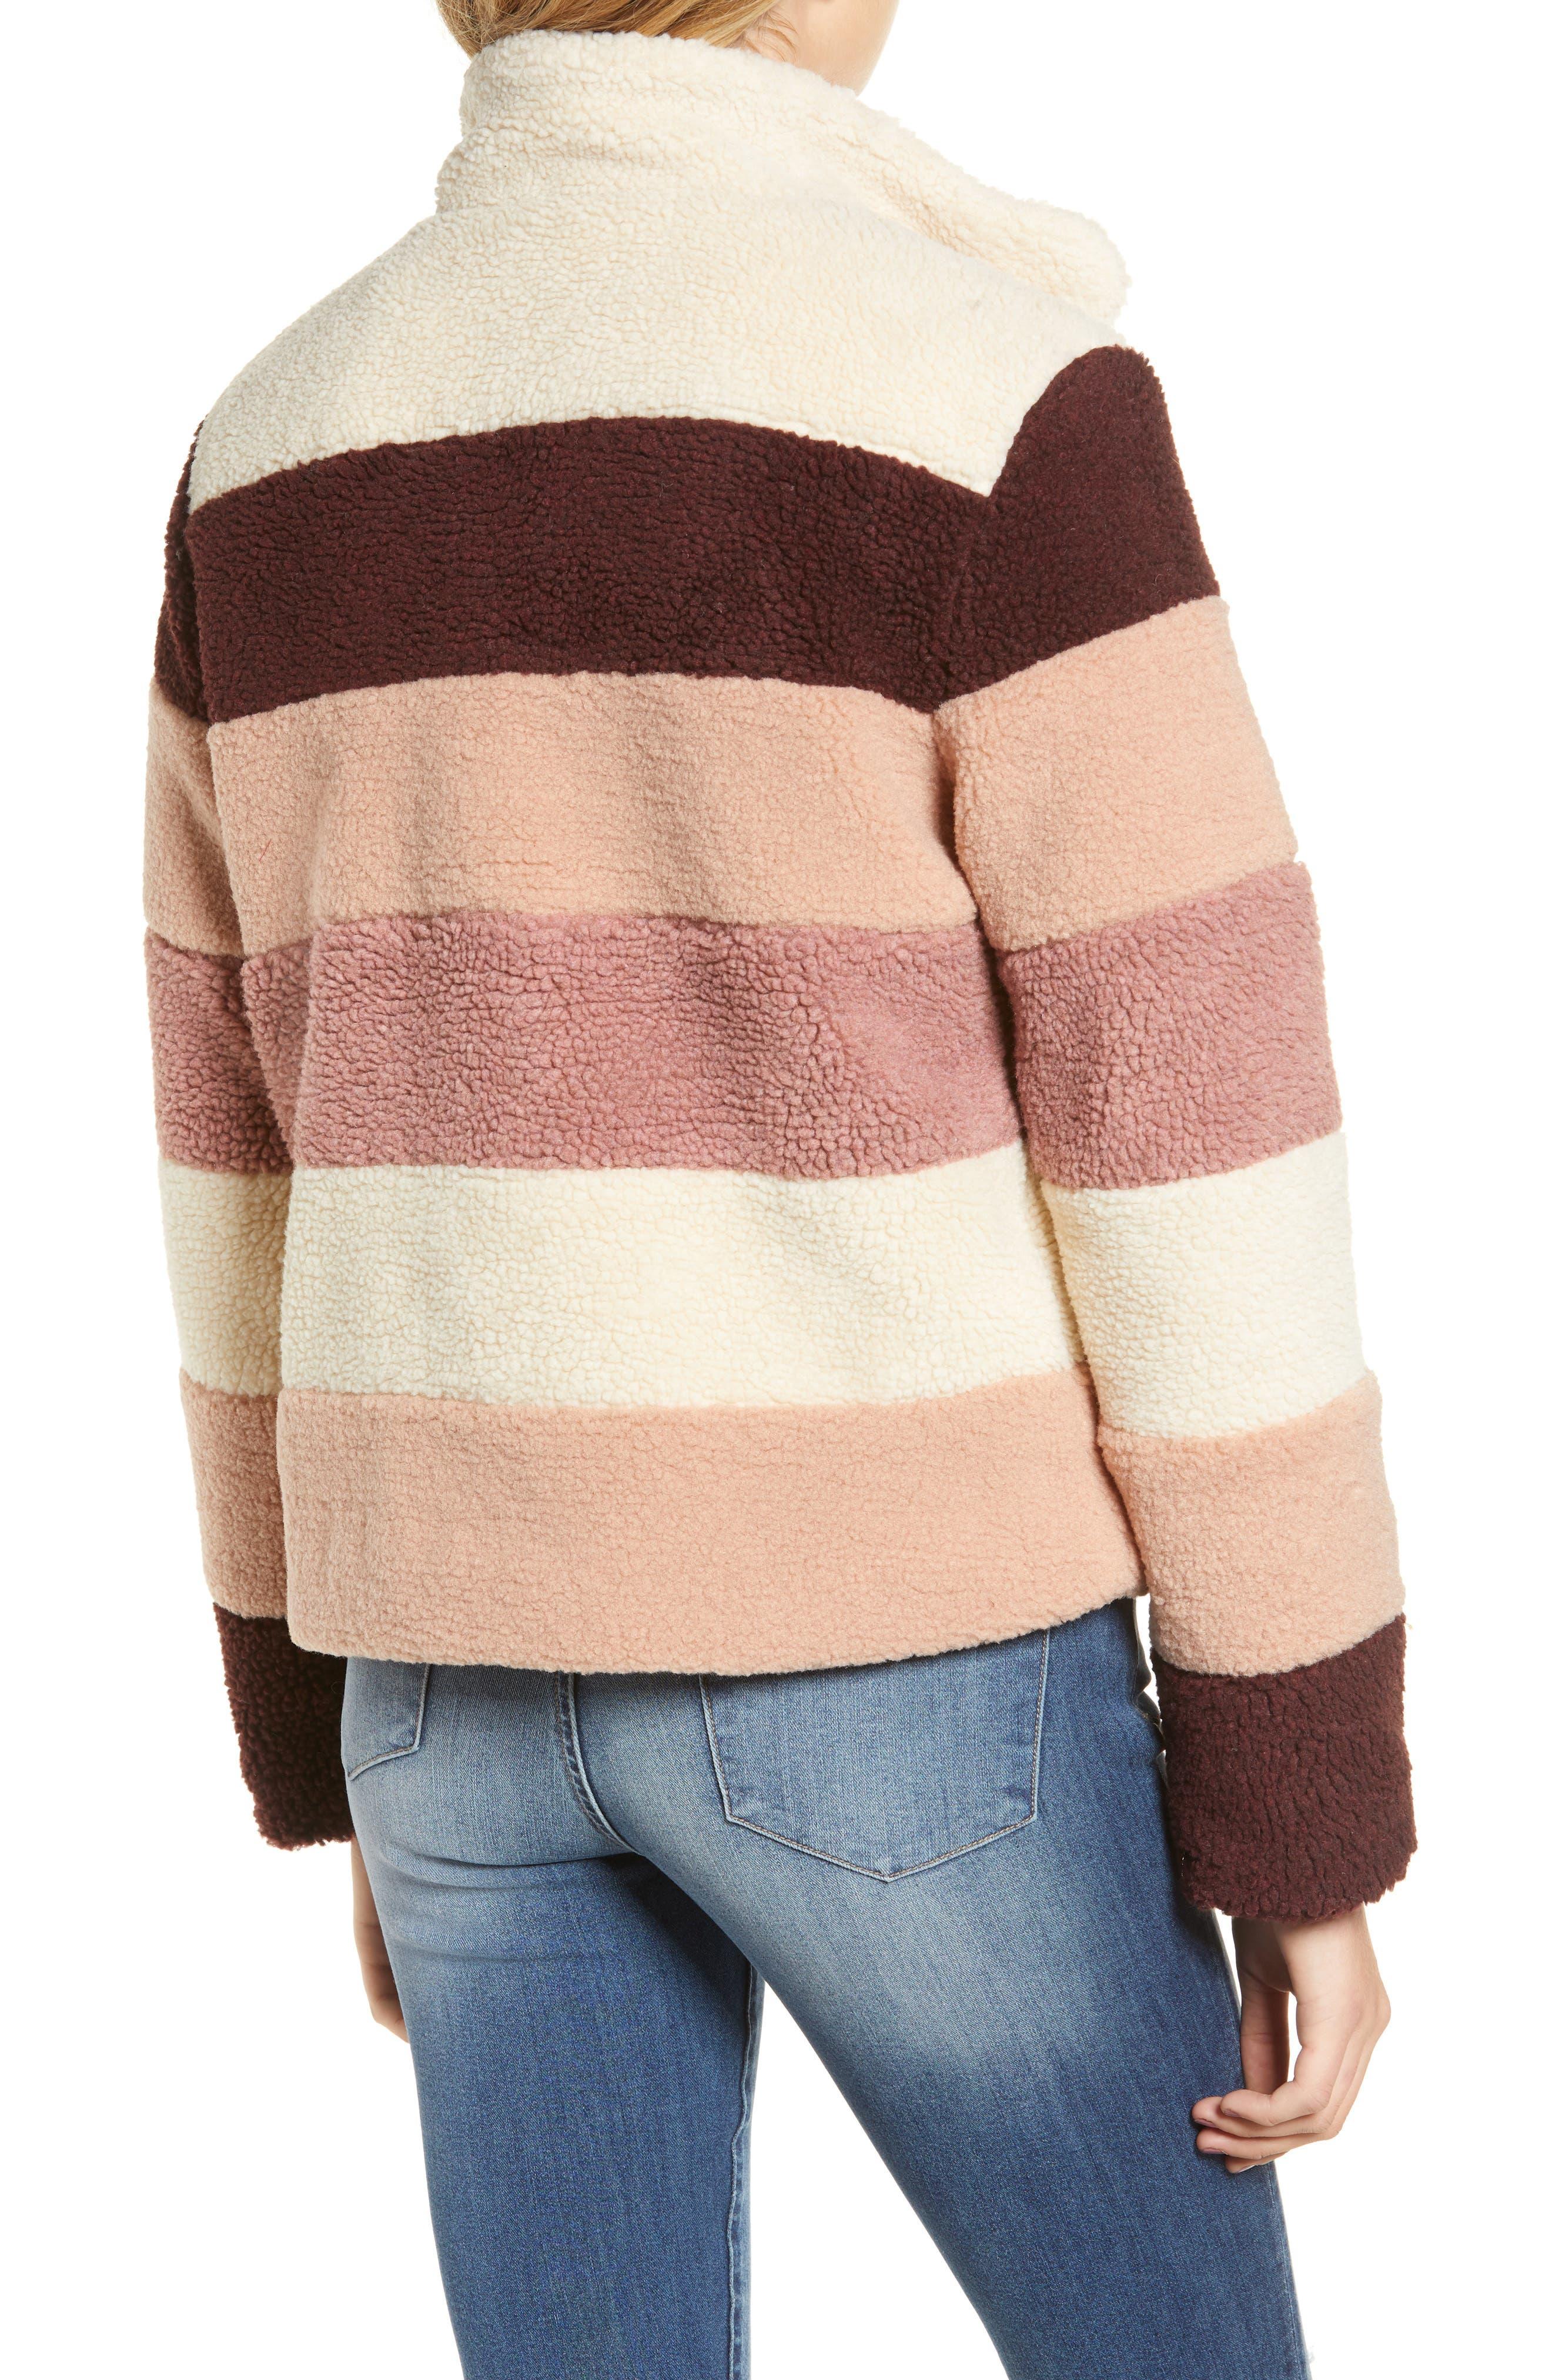 Stripe Faux Shearling Jacket,                             Alternate thumbnail 2, color,                             IVORY EGRET MUTLI STRIPE